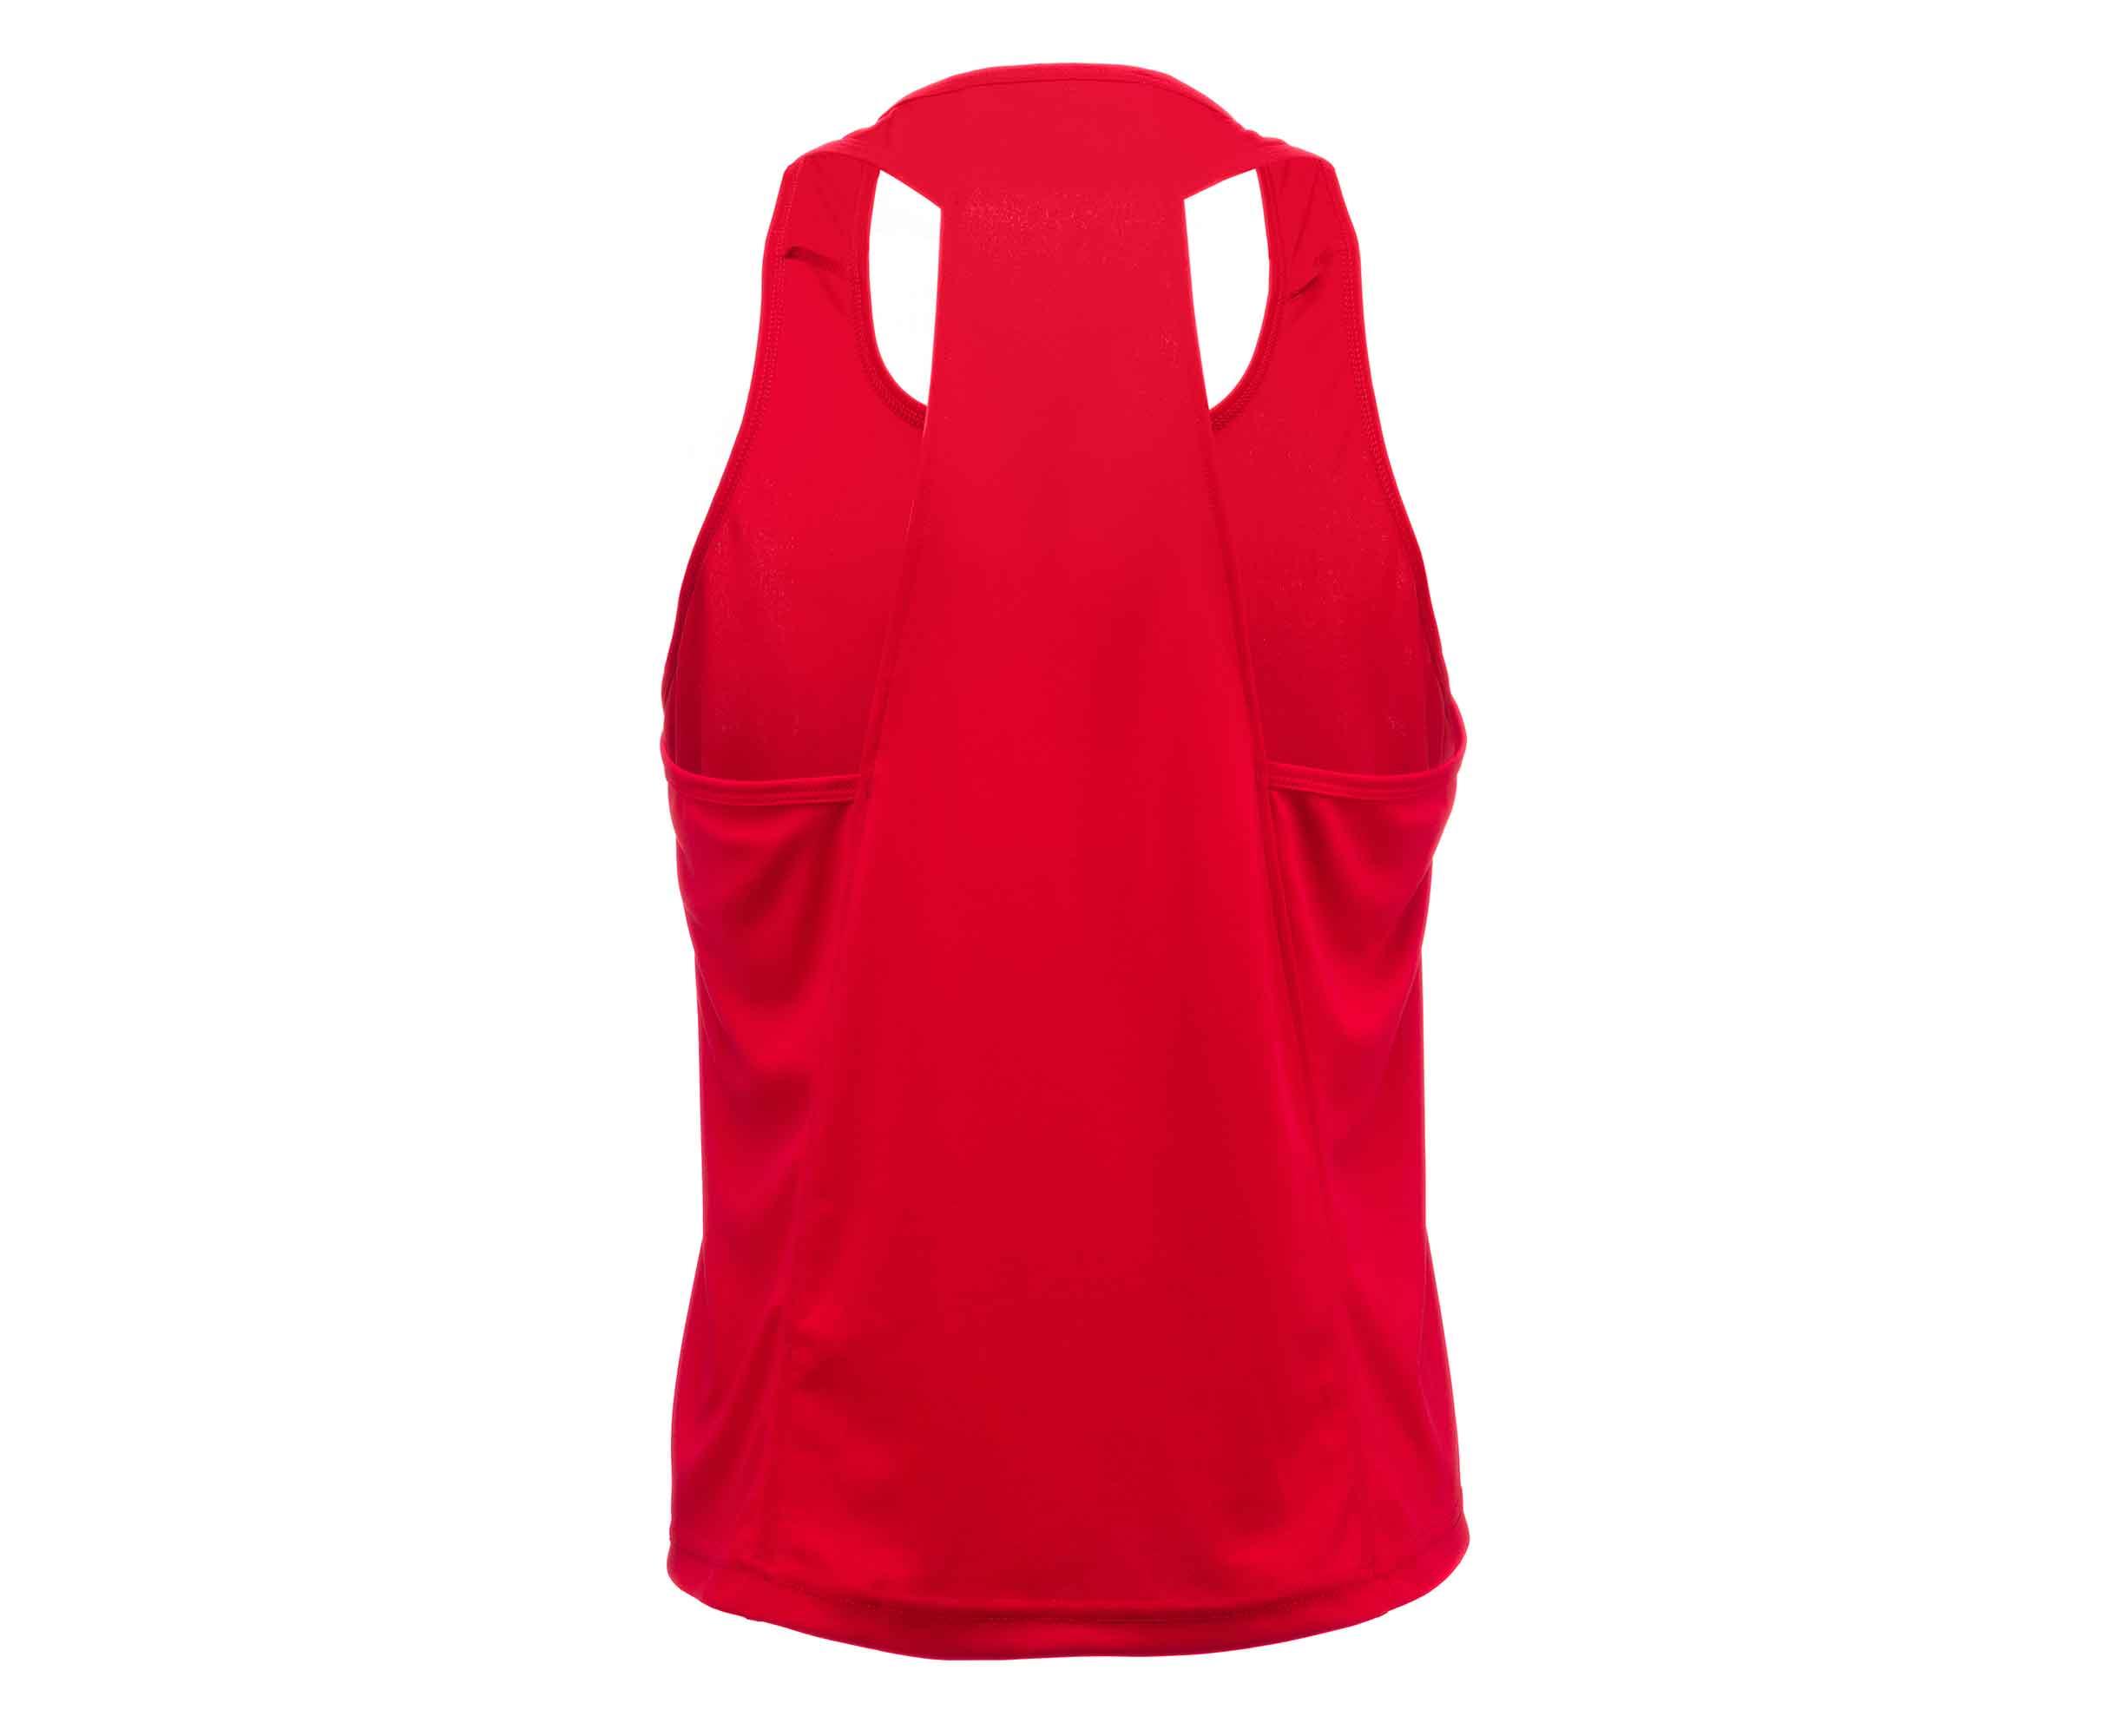 Майка боксерская Adidas Clinch Olimp красная 2XL